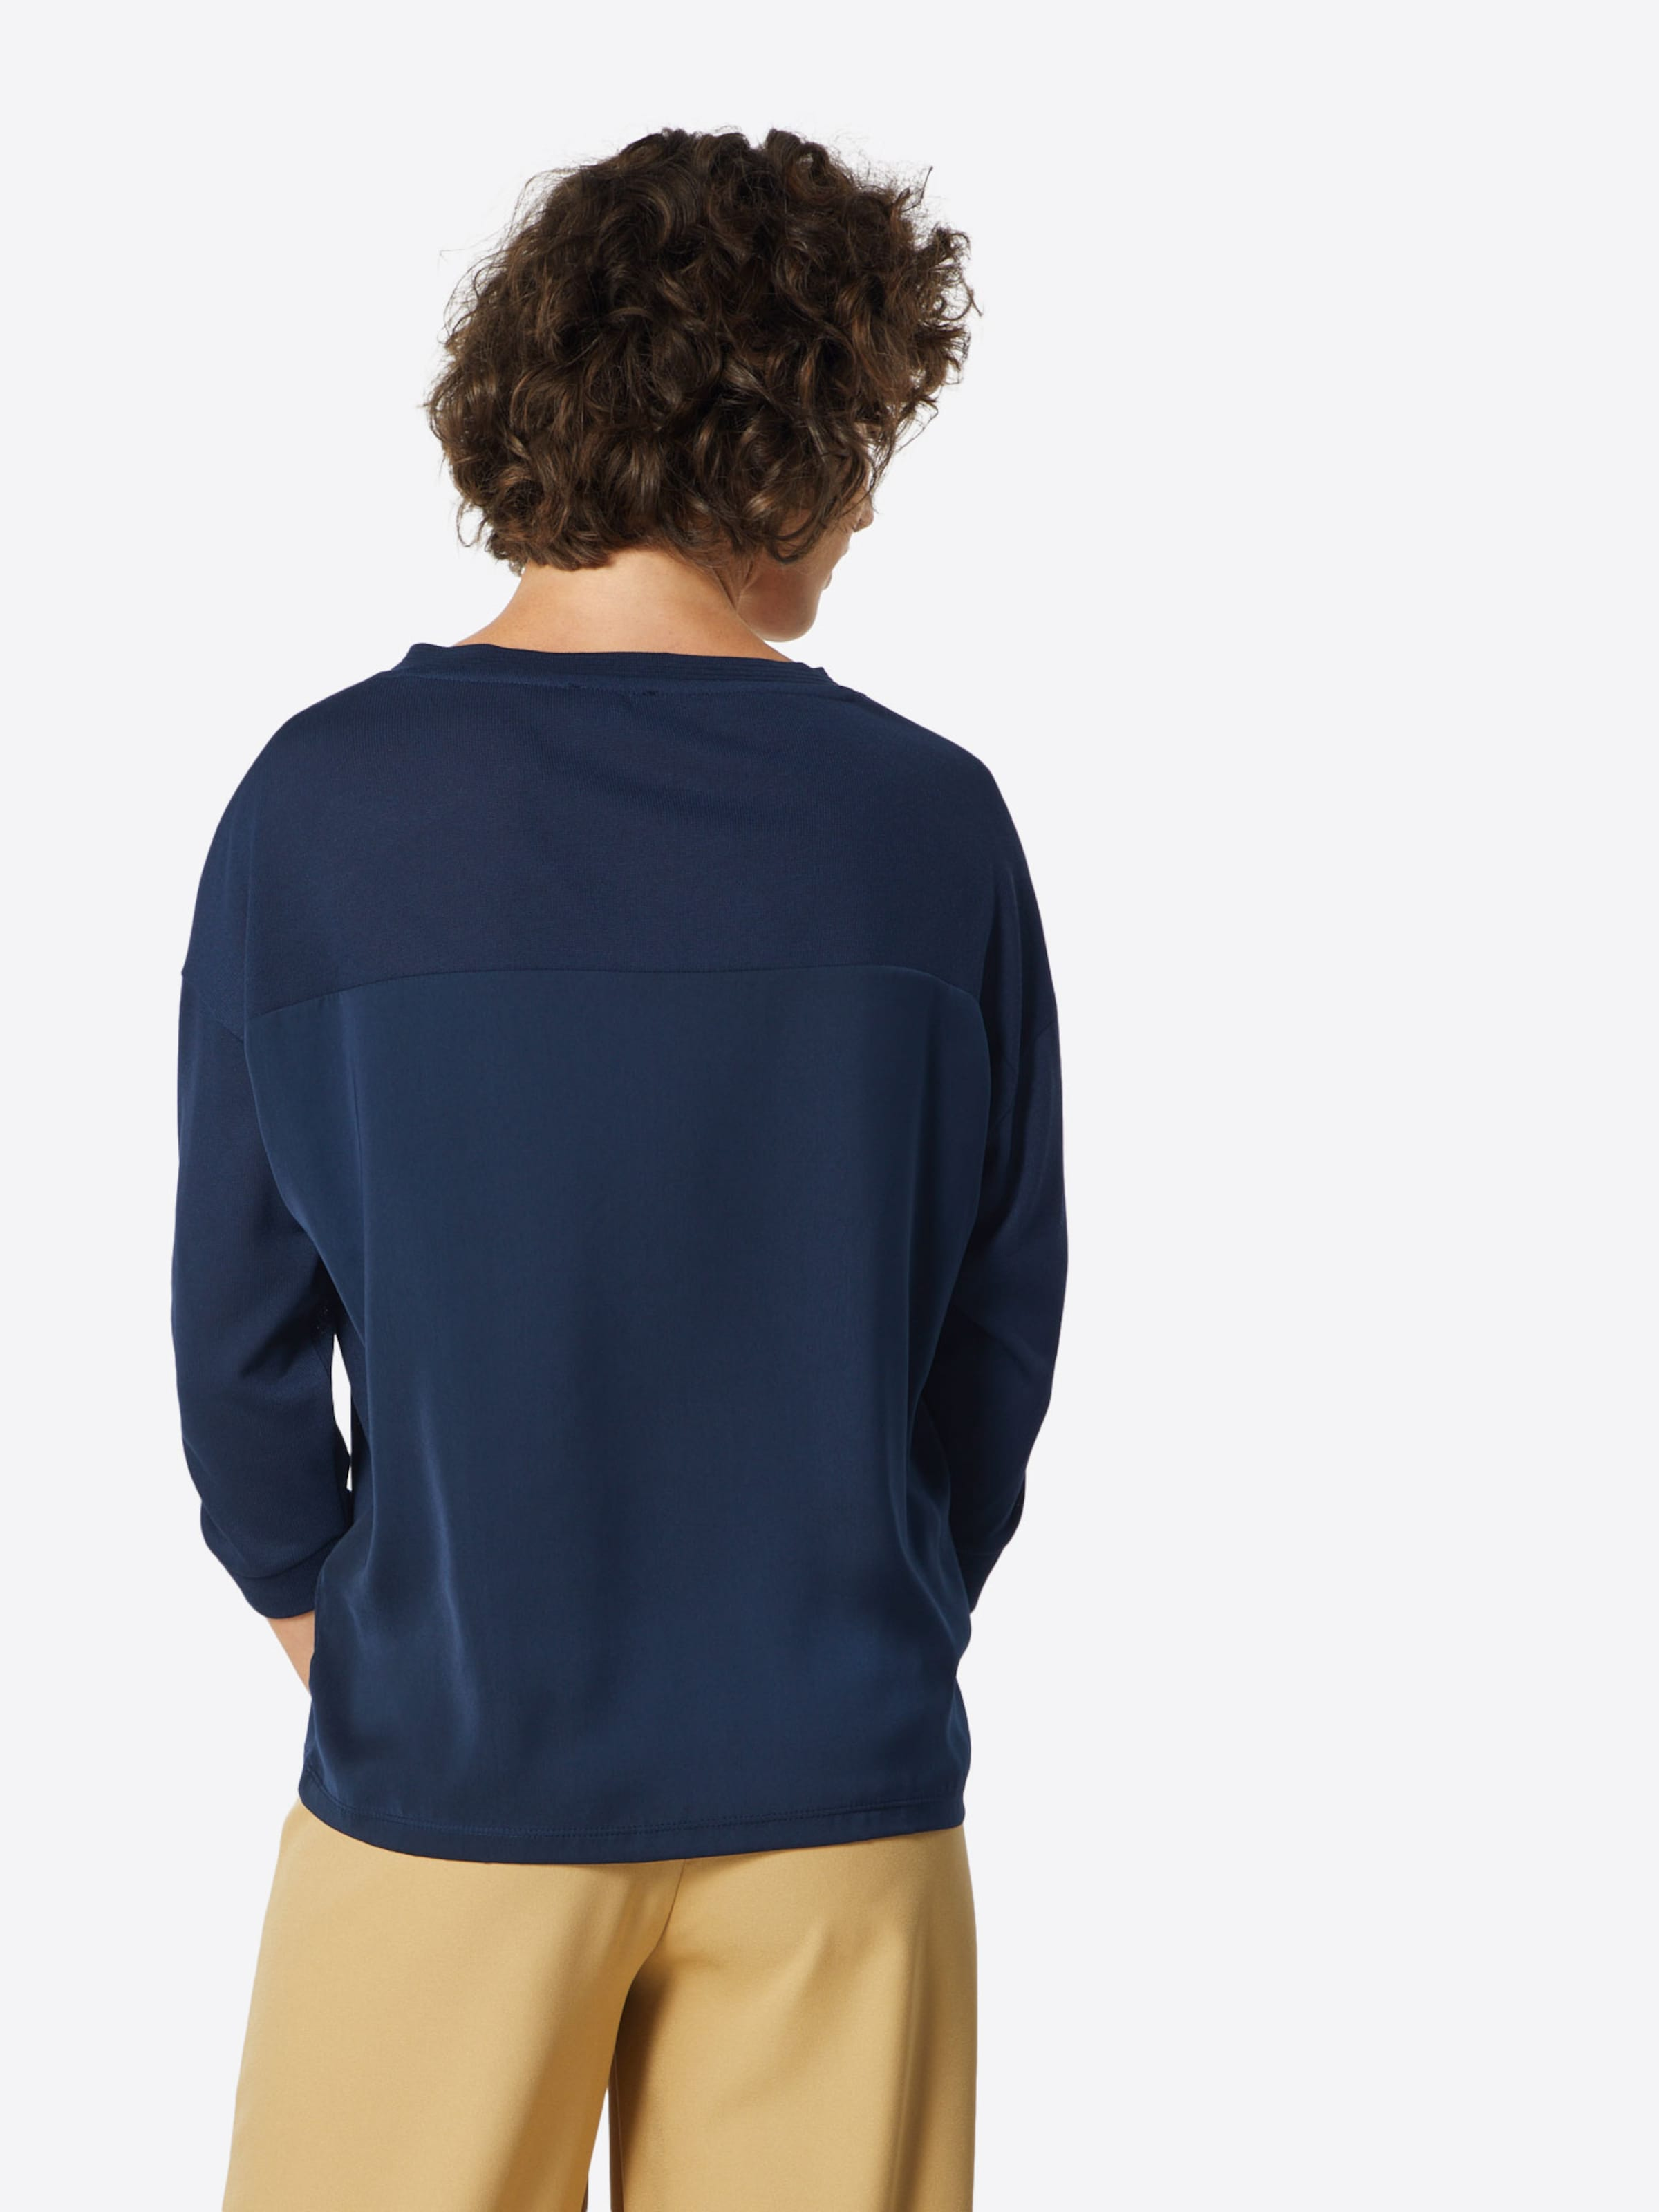 Tom En Bleu T Tailor Marine shirt cF1TKulJ3